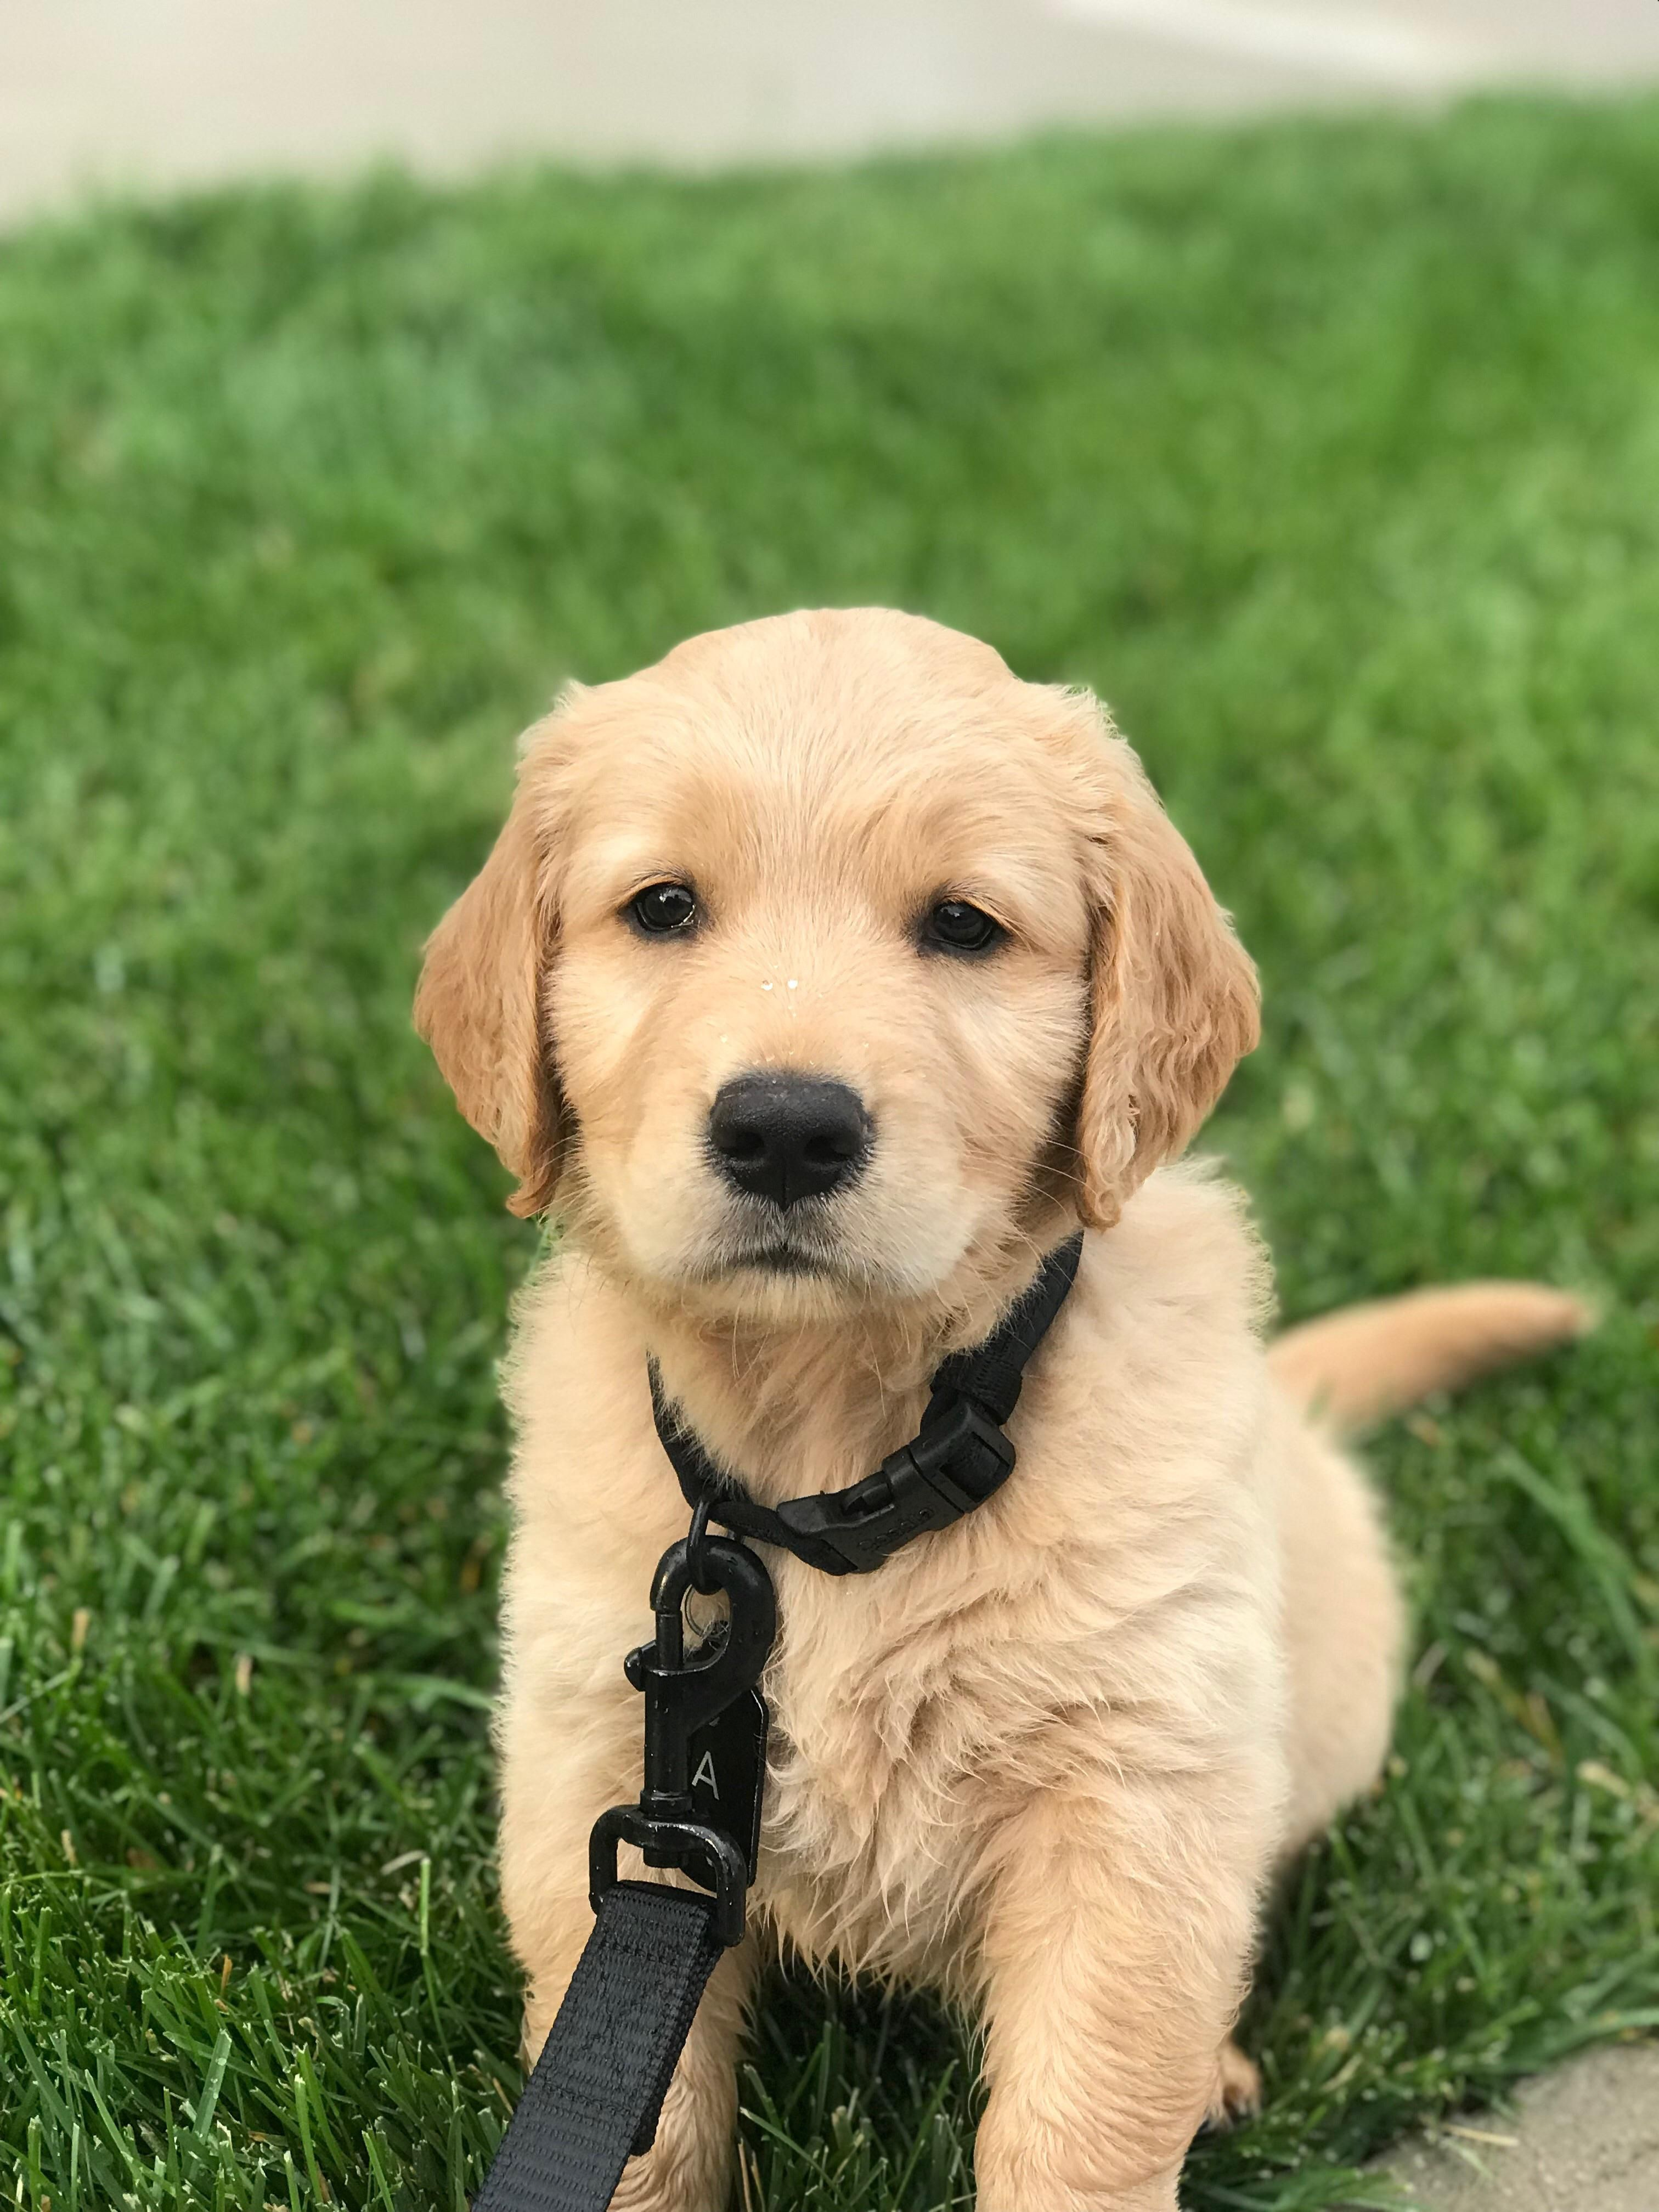 Day 2 golden retriever puppy retriever puppy golden